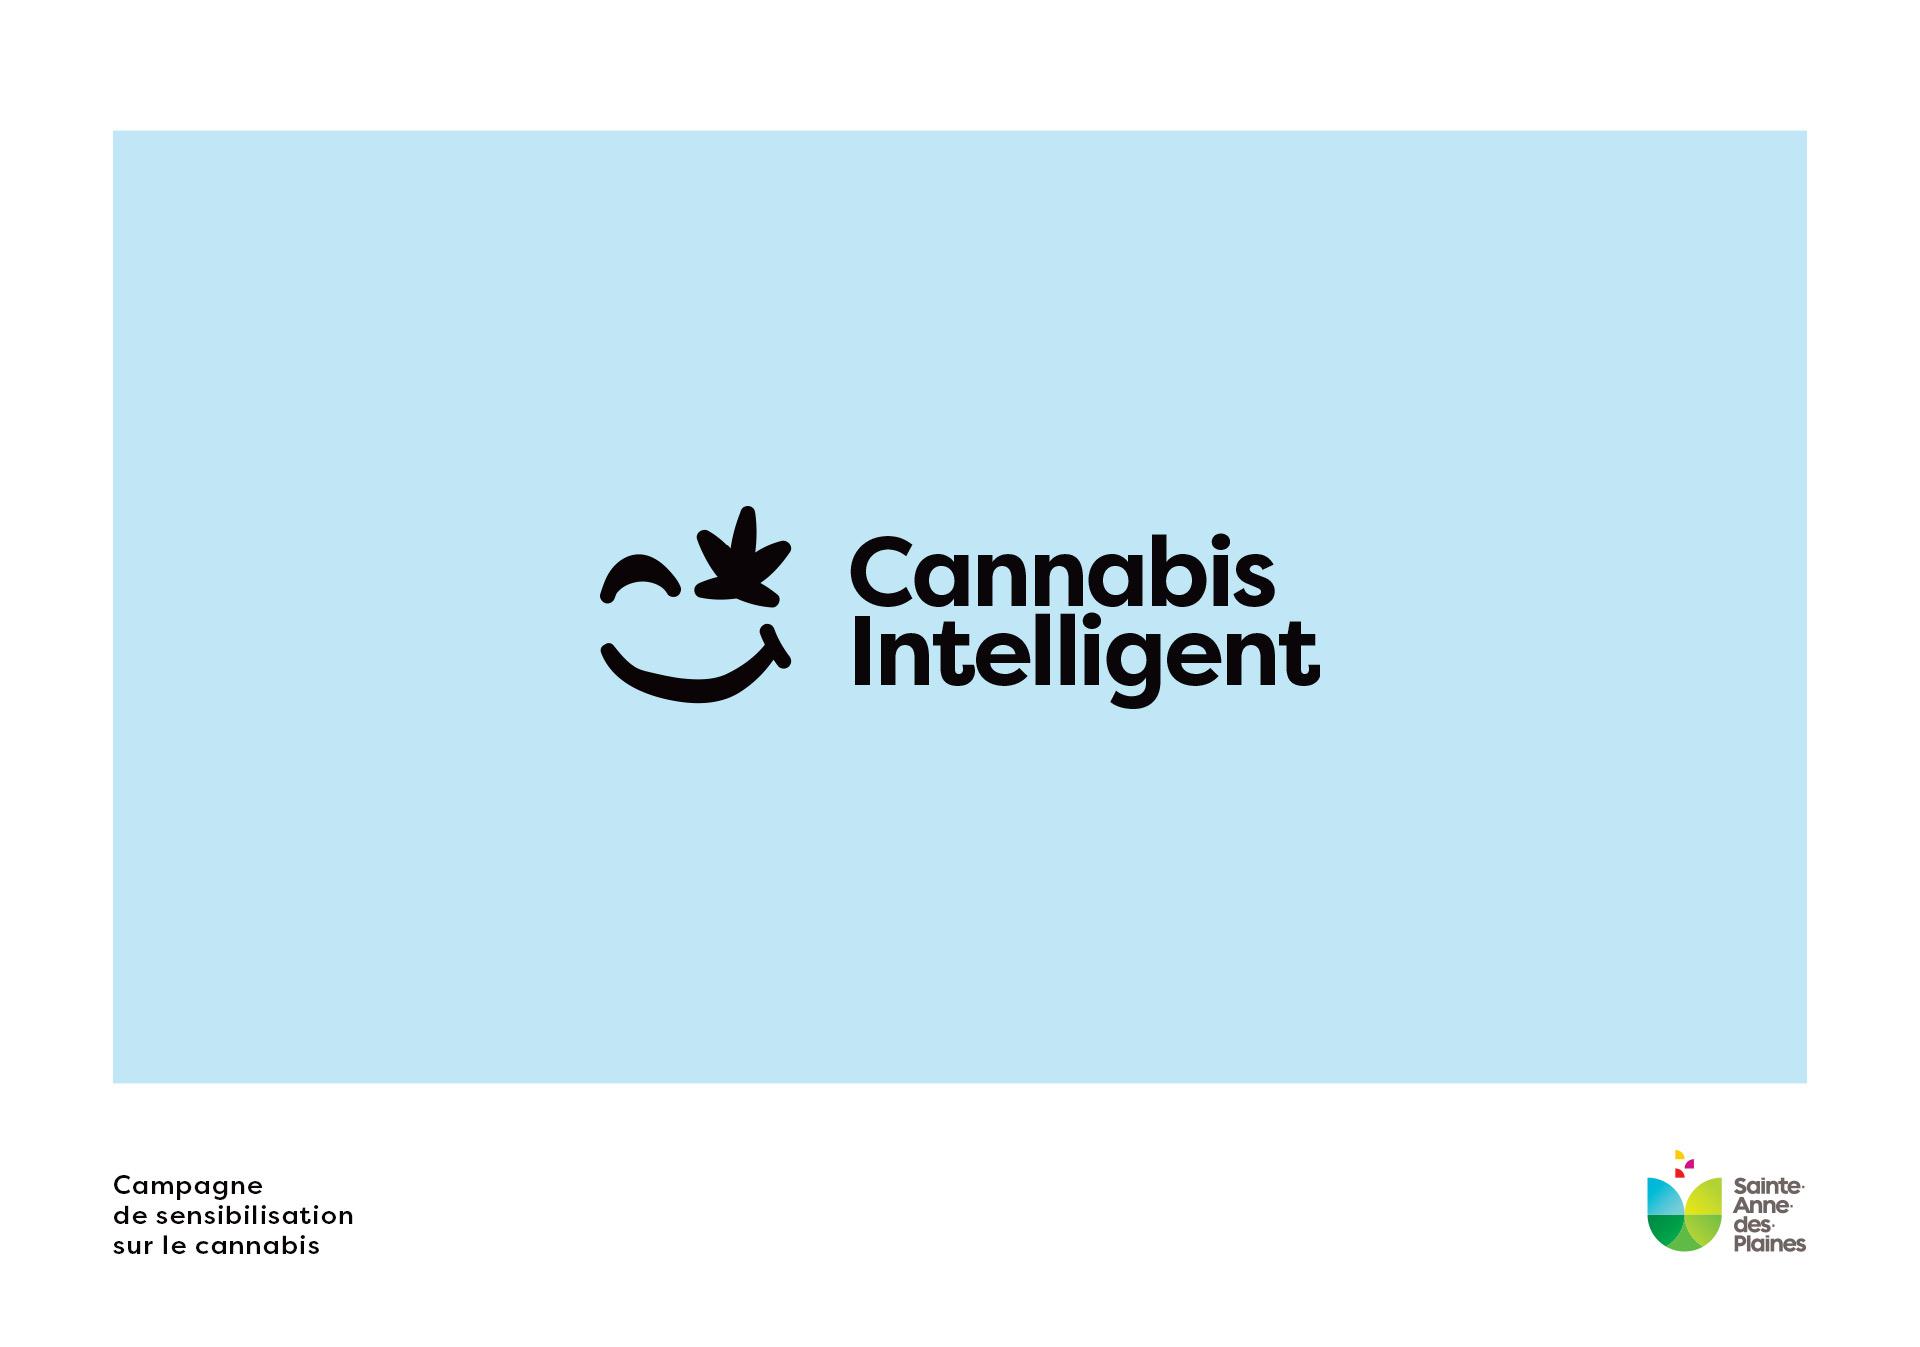 Cannabis intellident - Campagne de sensibilisation